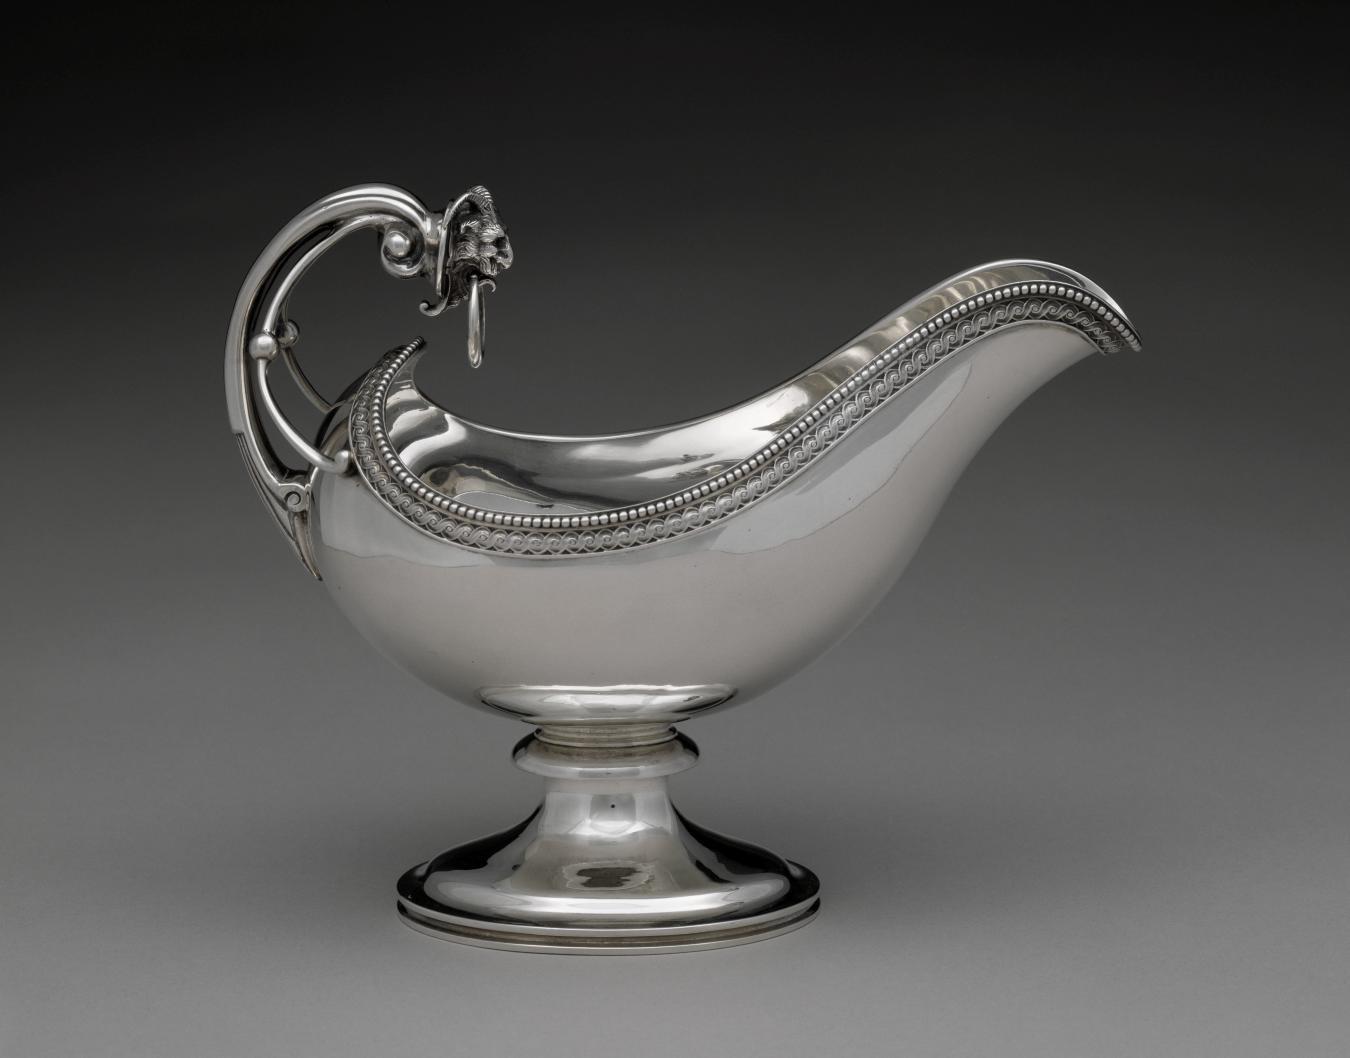 J. E. Caldwell & Co., Sauceboat, 1860–75, silver, the Bayou Bend Collection